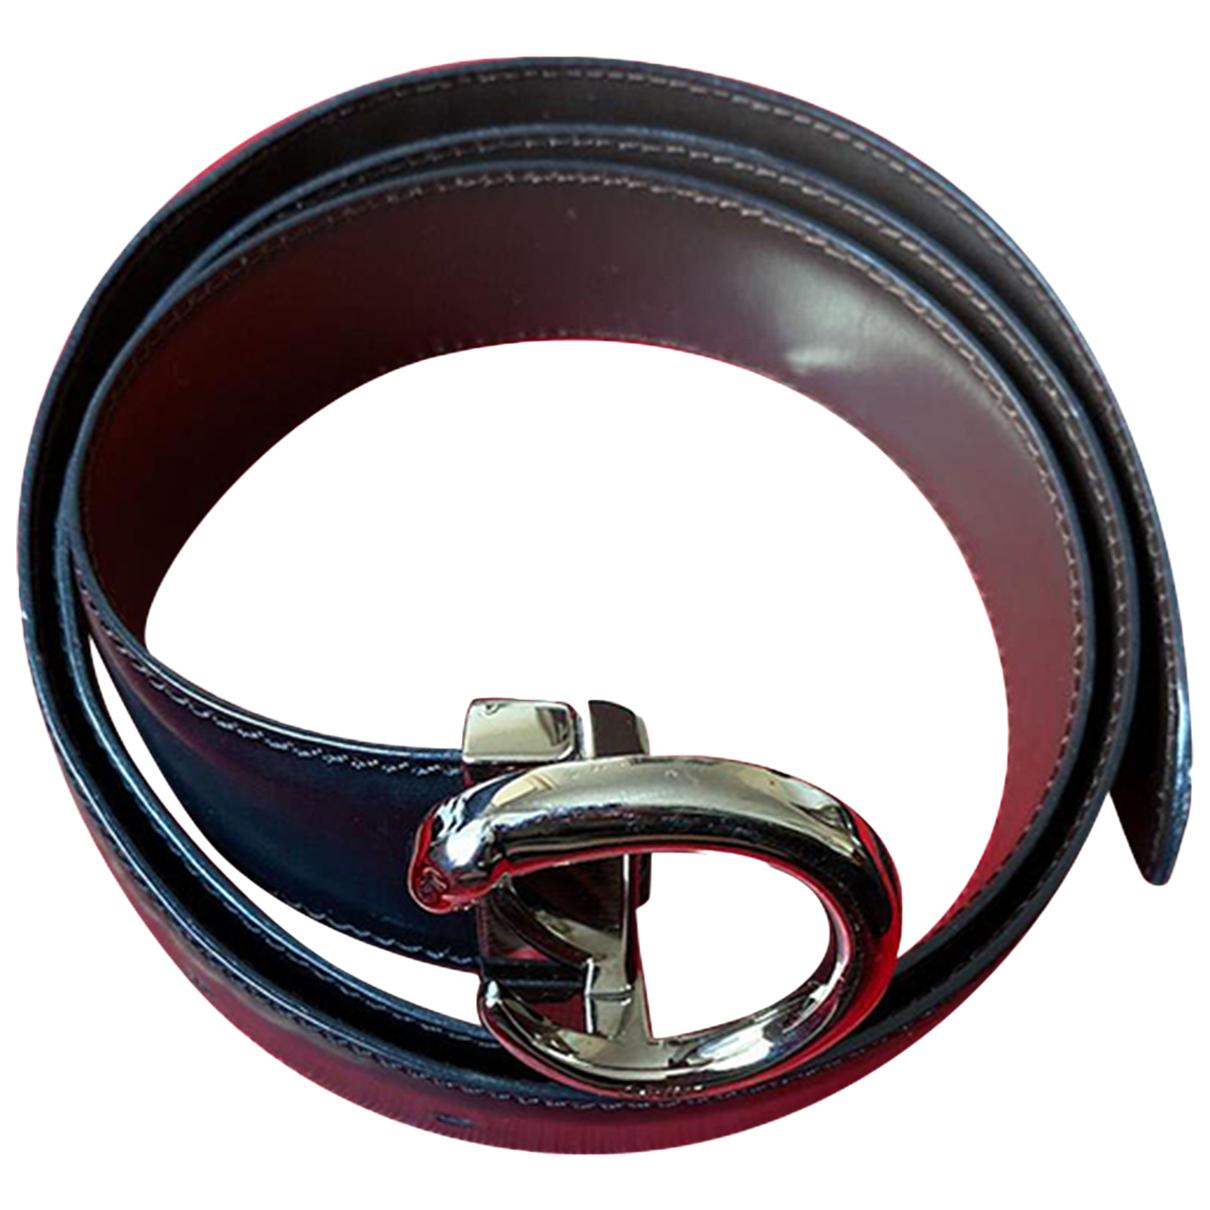 Cartier N Black Leather belt for Women 90 cm